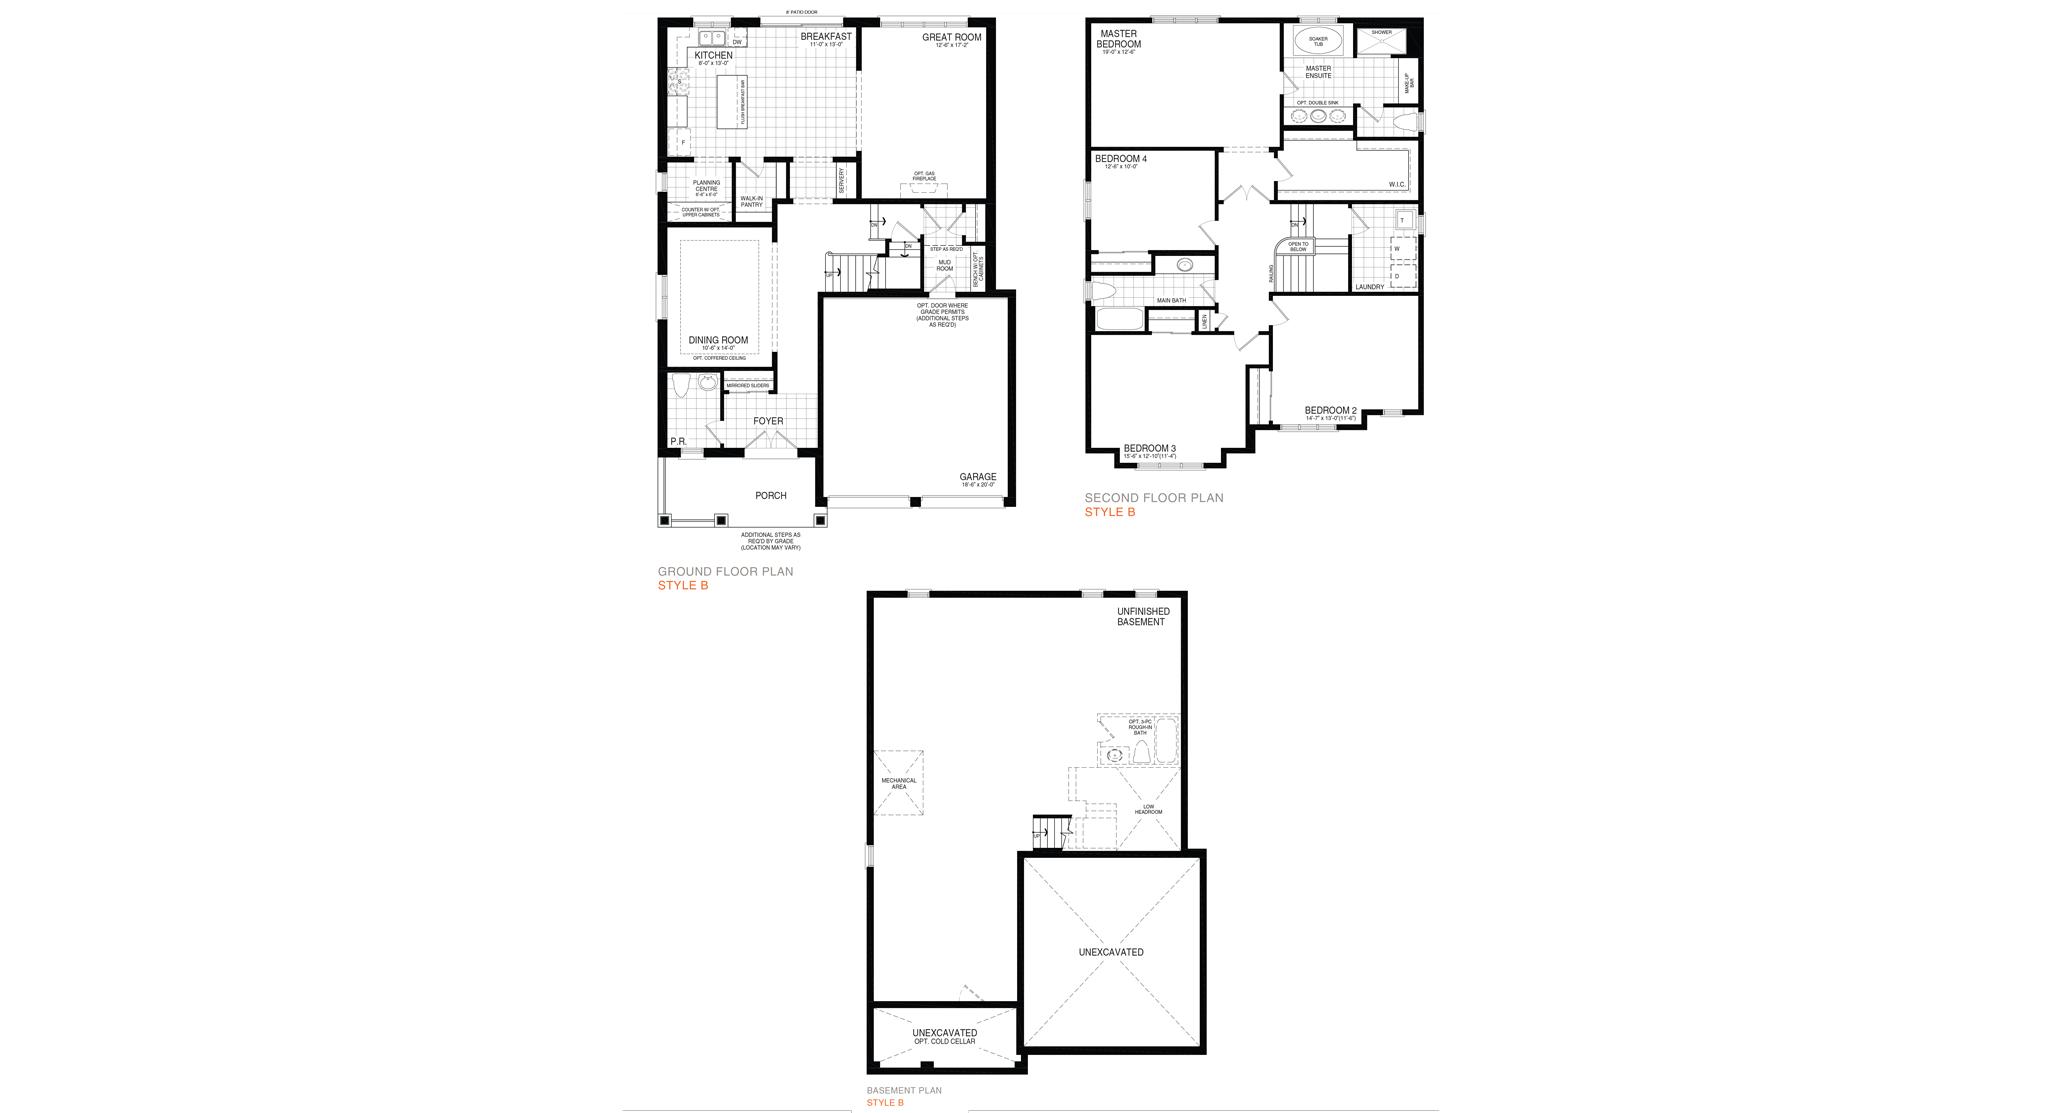 35874-arcadia-riverland-floor-plan